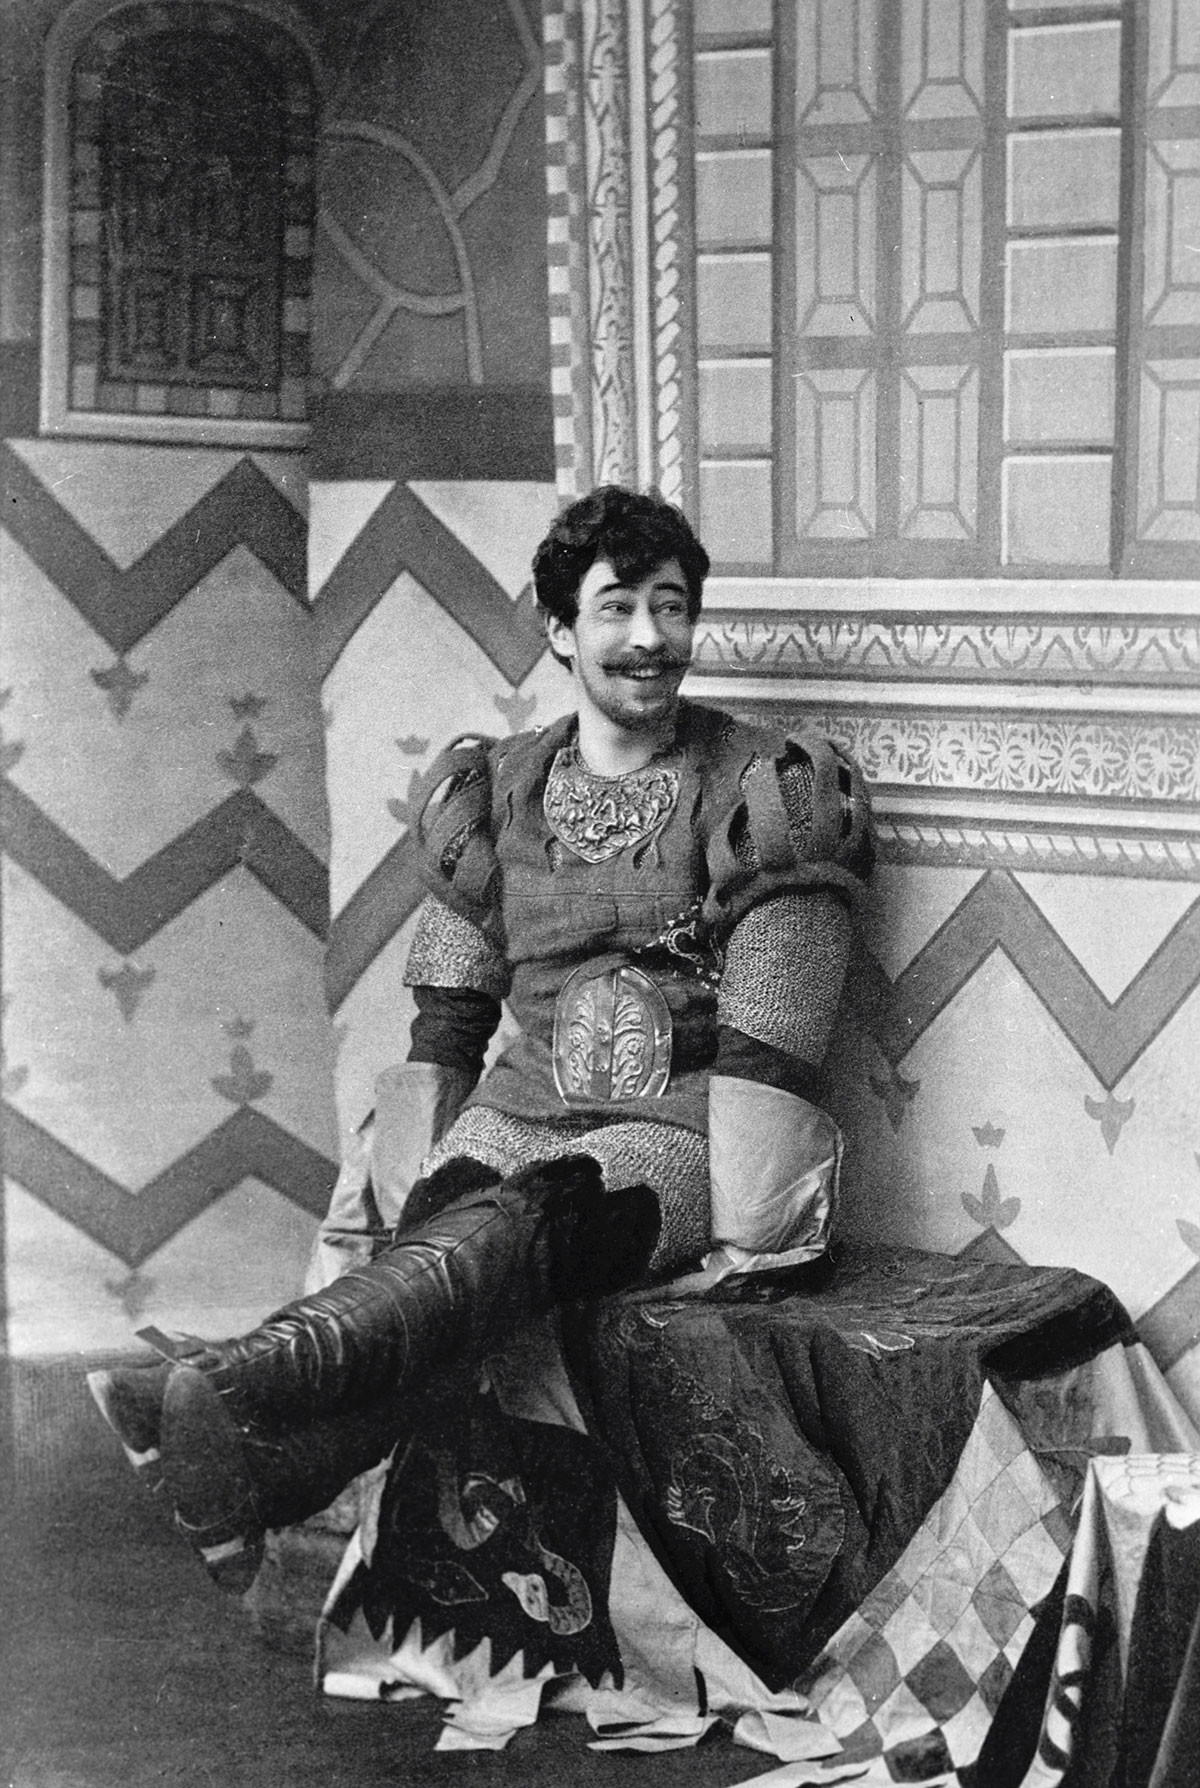 Konstantin Stanislavsky as Benedick in 'Much Ado About Nothing' in 1897.